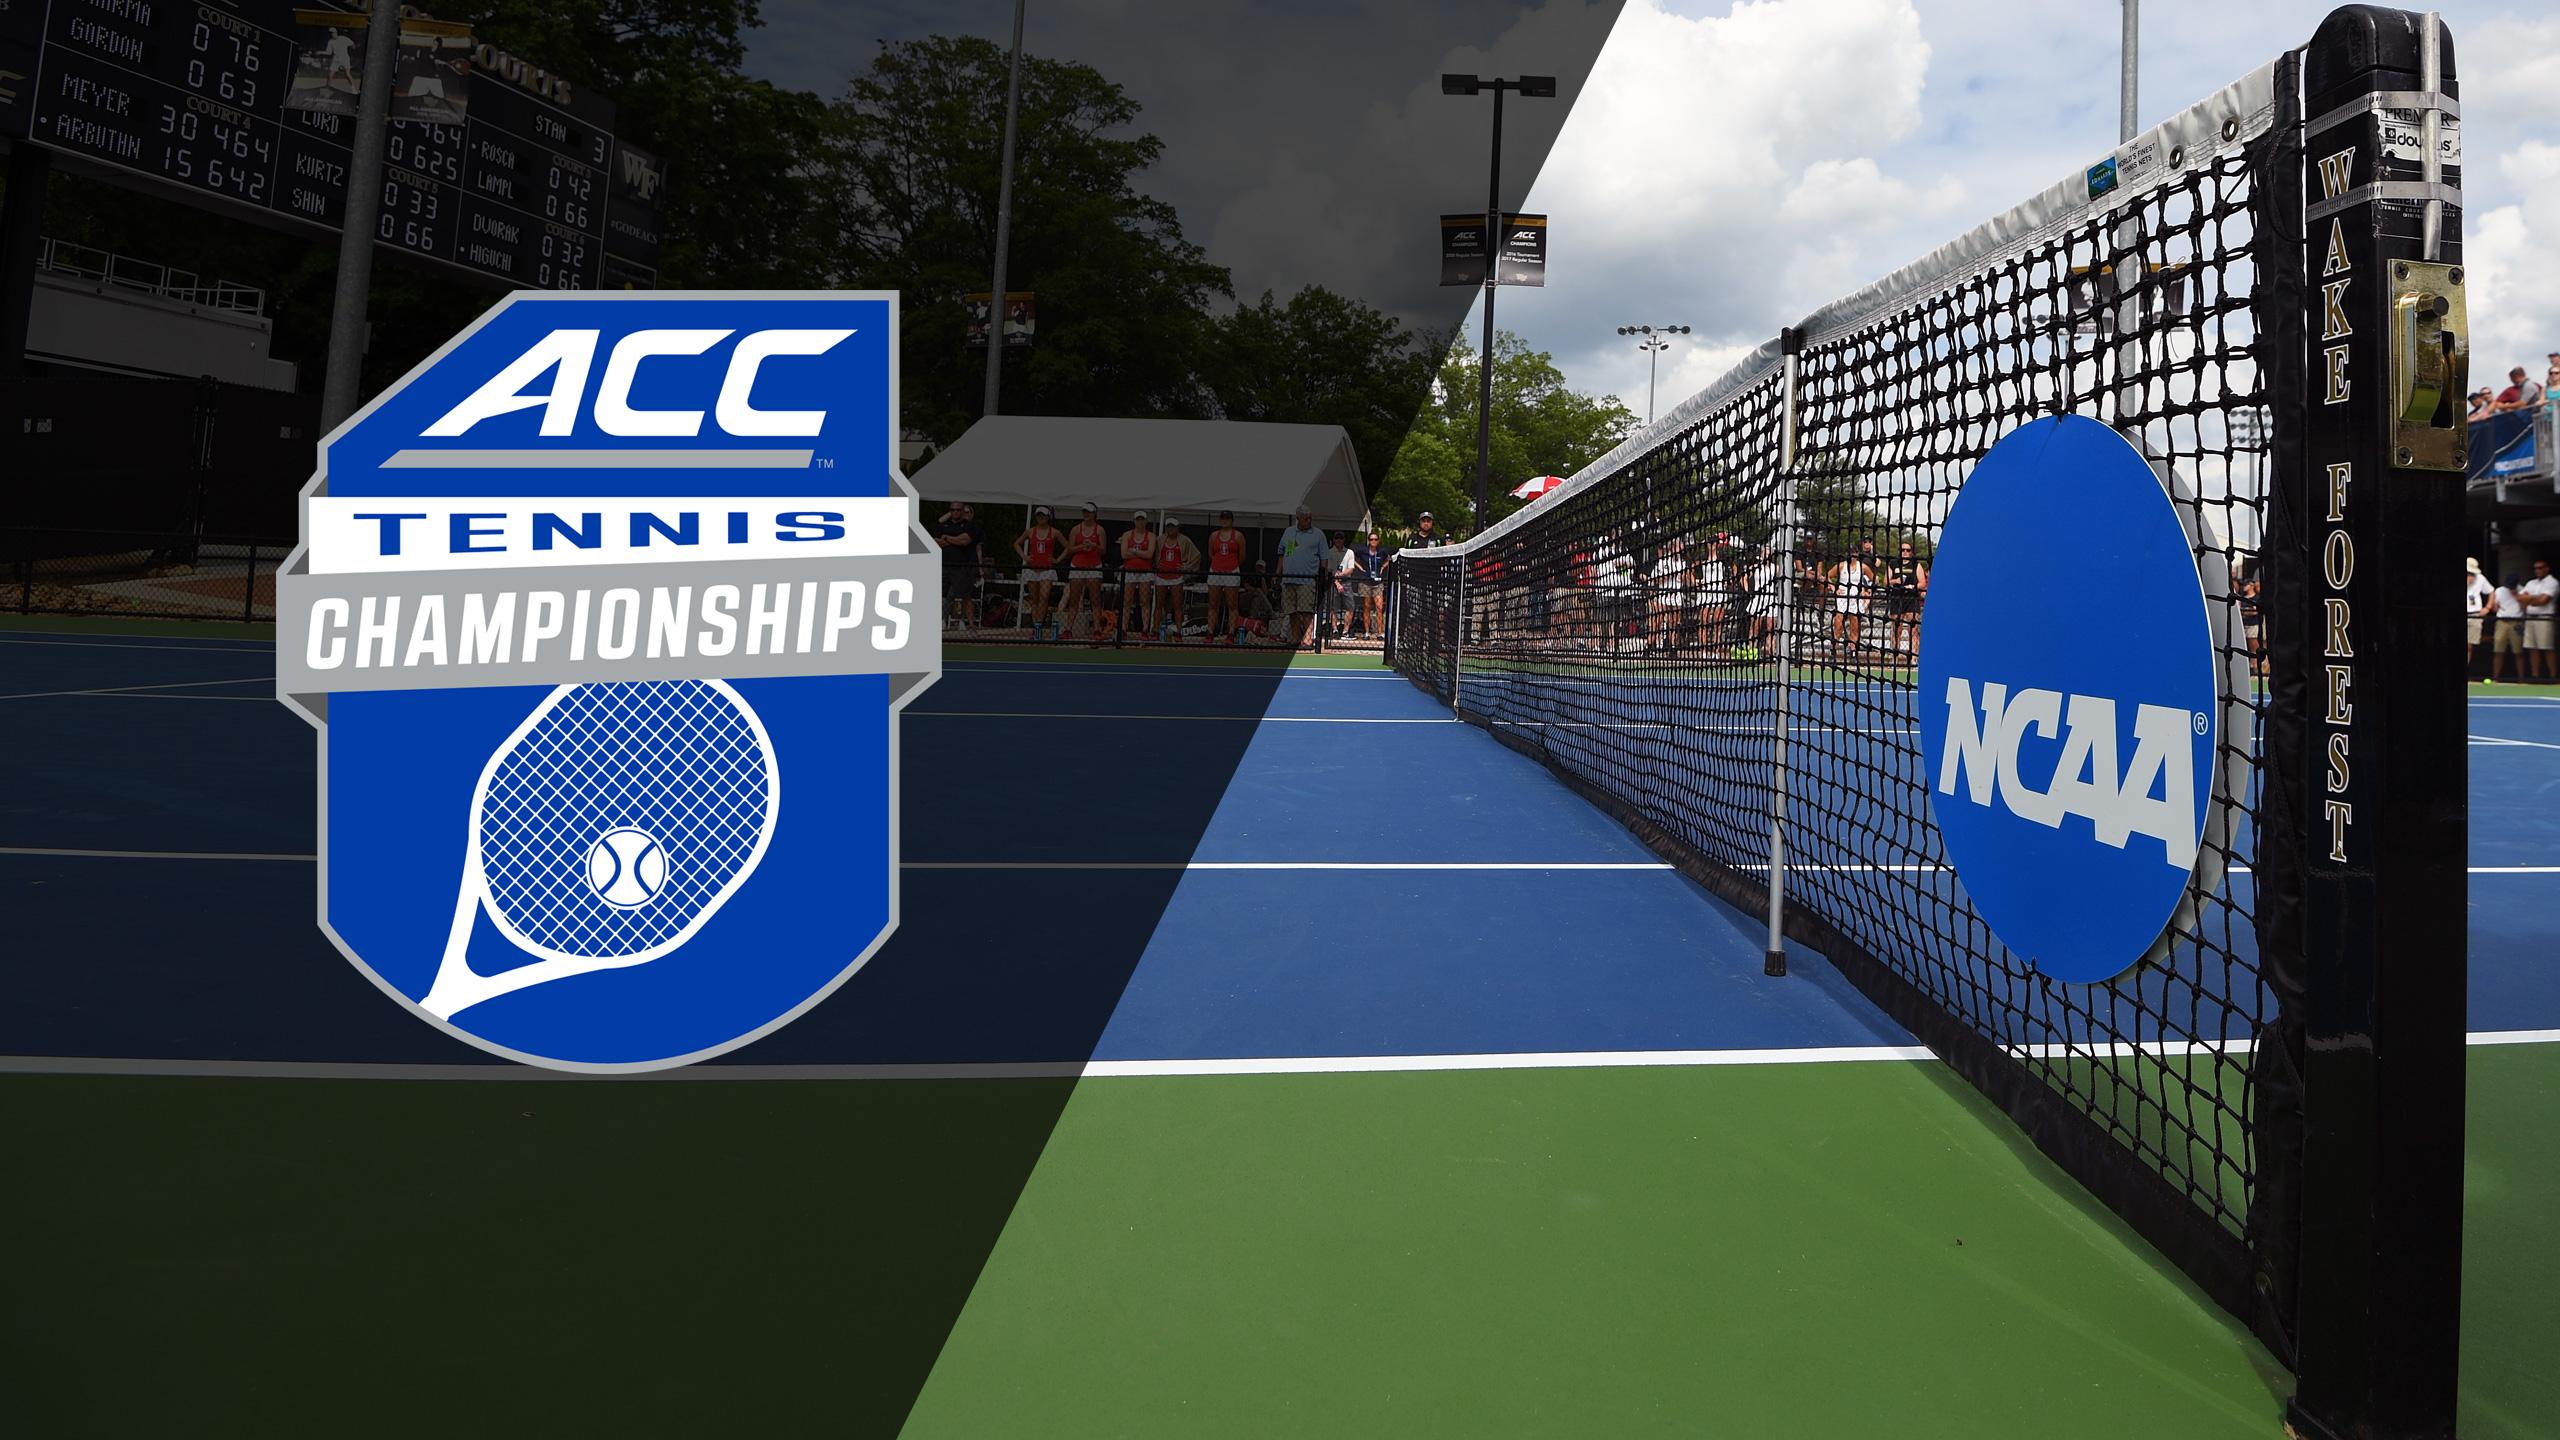 ACC Women's Tennis Championship (Women's Semifinals)